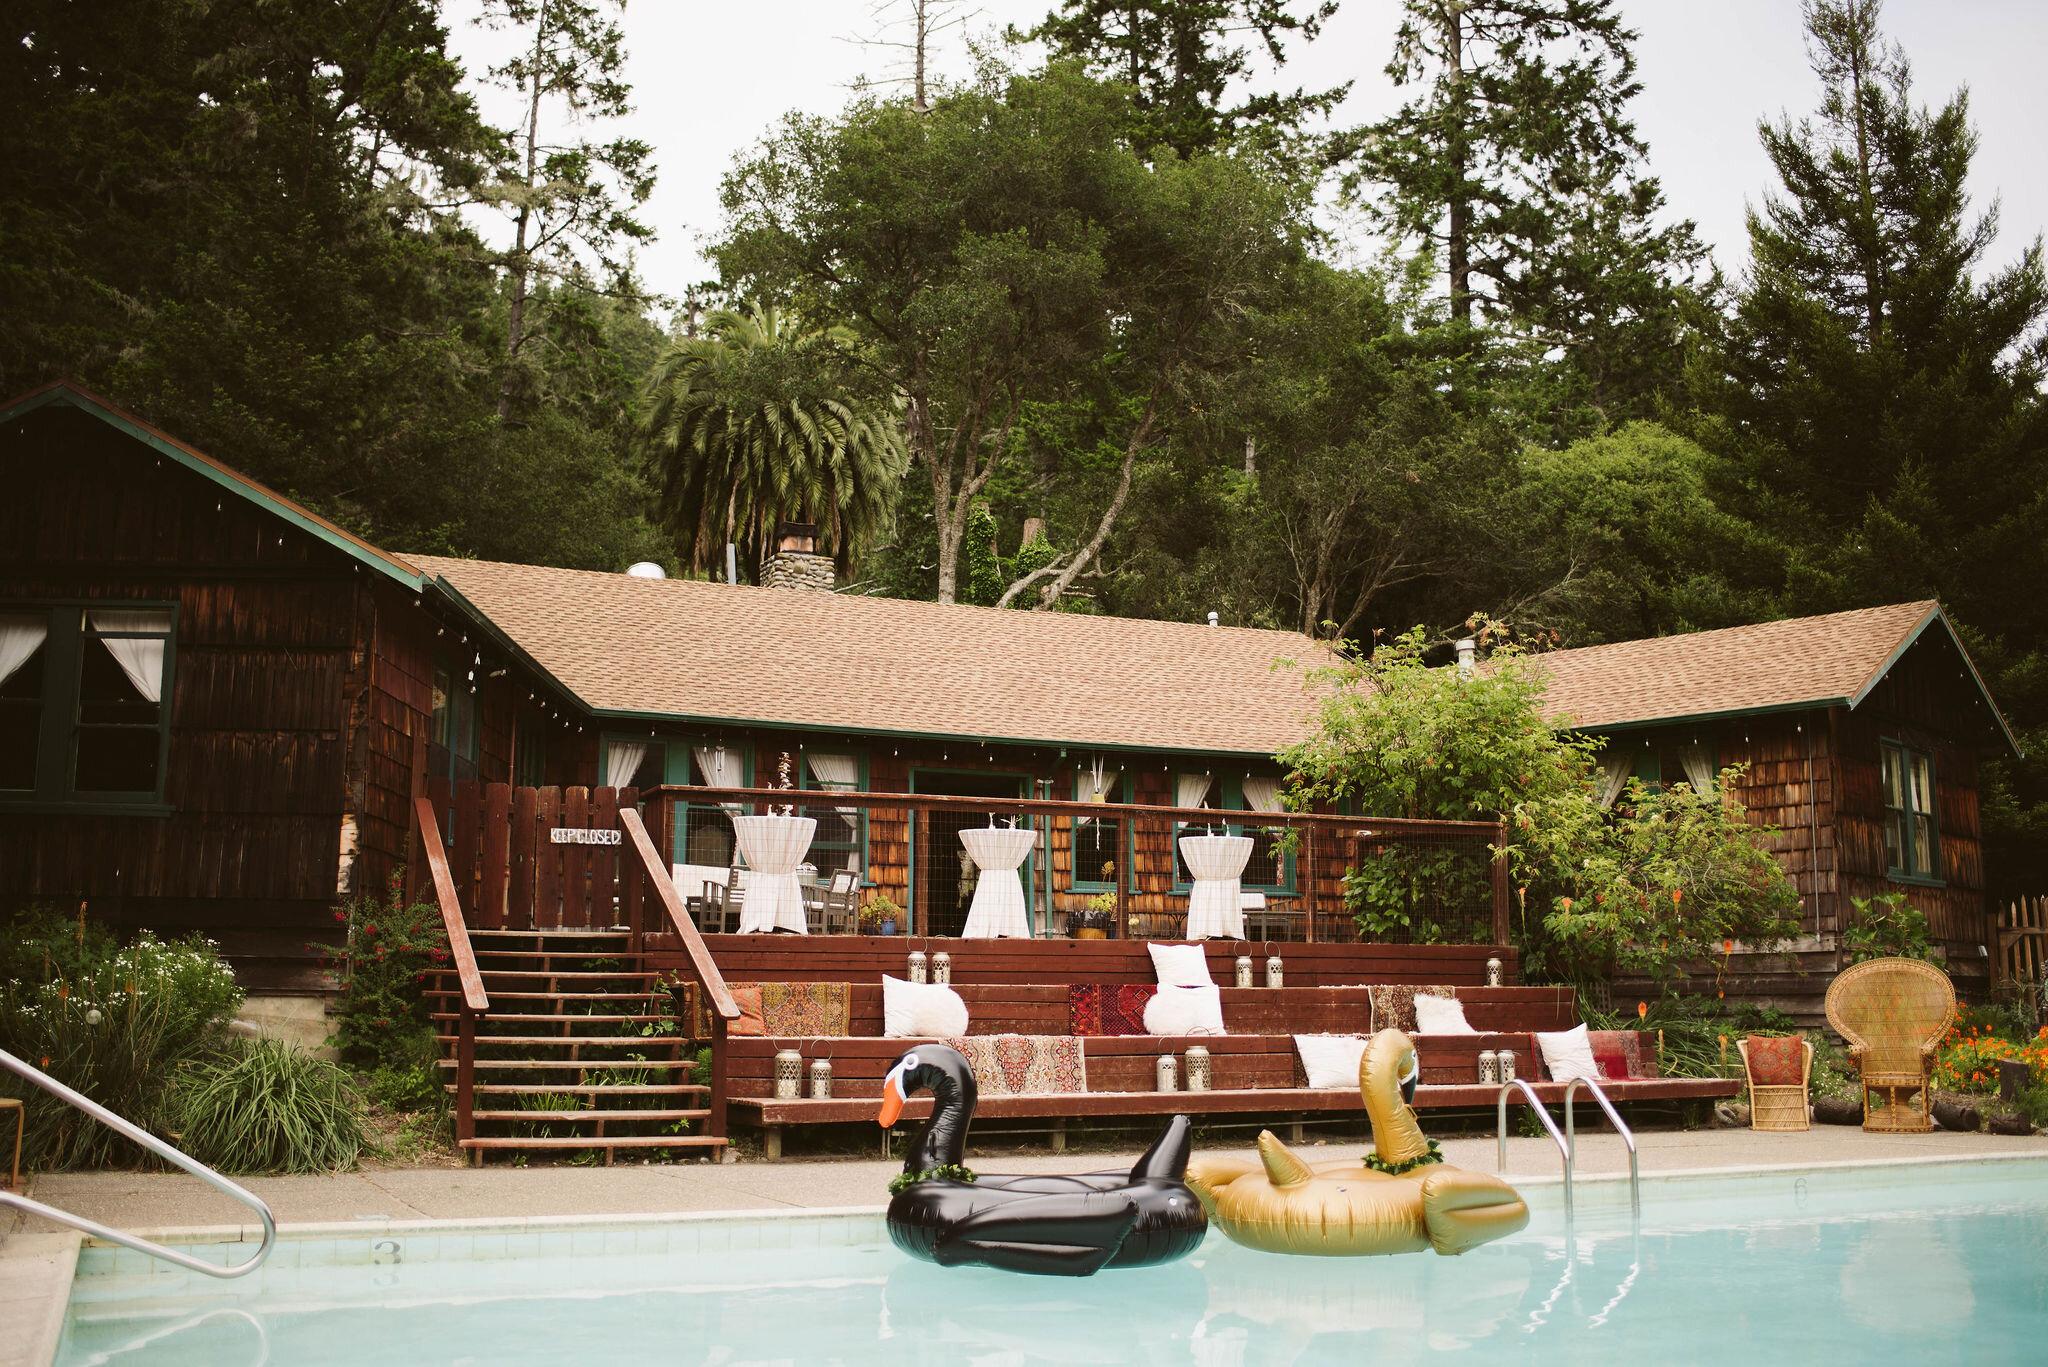 Venture-Retreat-Center-Wedding-Pescadero-Sat-Aaron-Pritam-The-Shalom-Imaginative-503.jpg